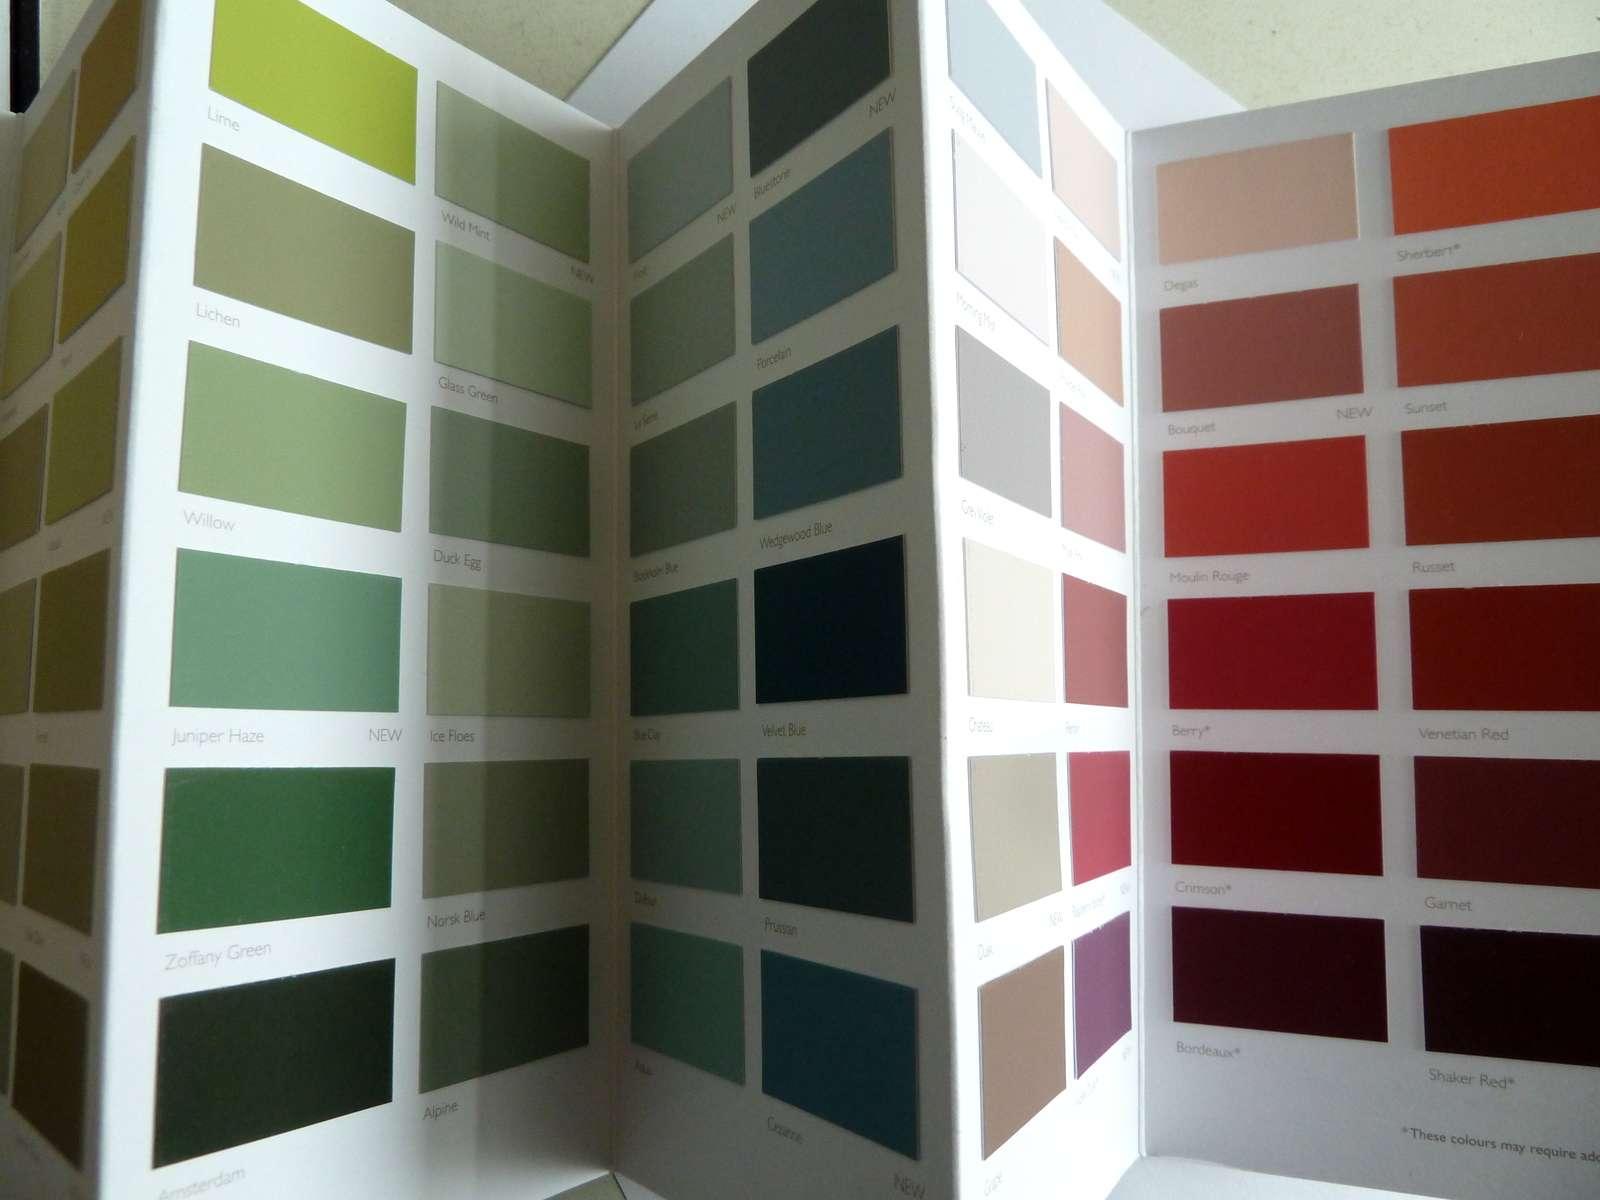 Free Dulux Emulsion Colour Chart Can Buy Granocryl Paints With Dulux Exterior Paint Colour Chart